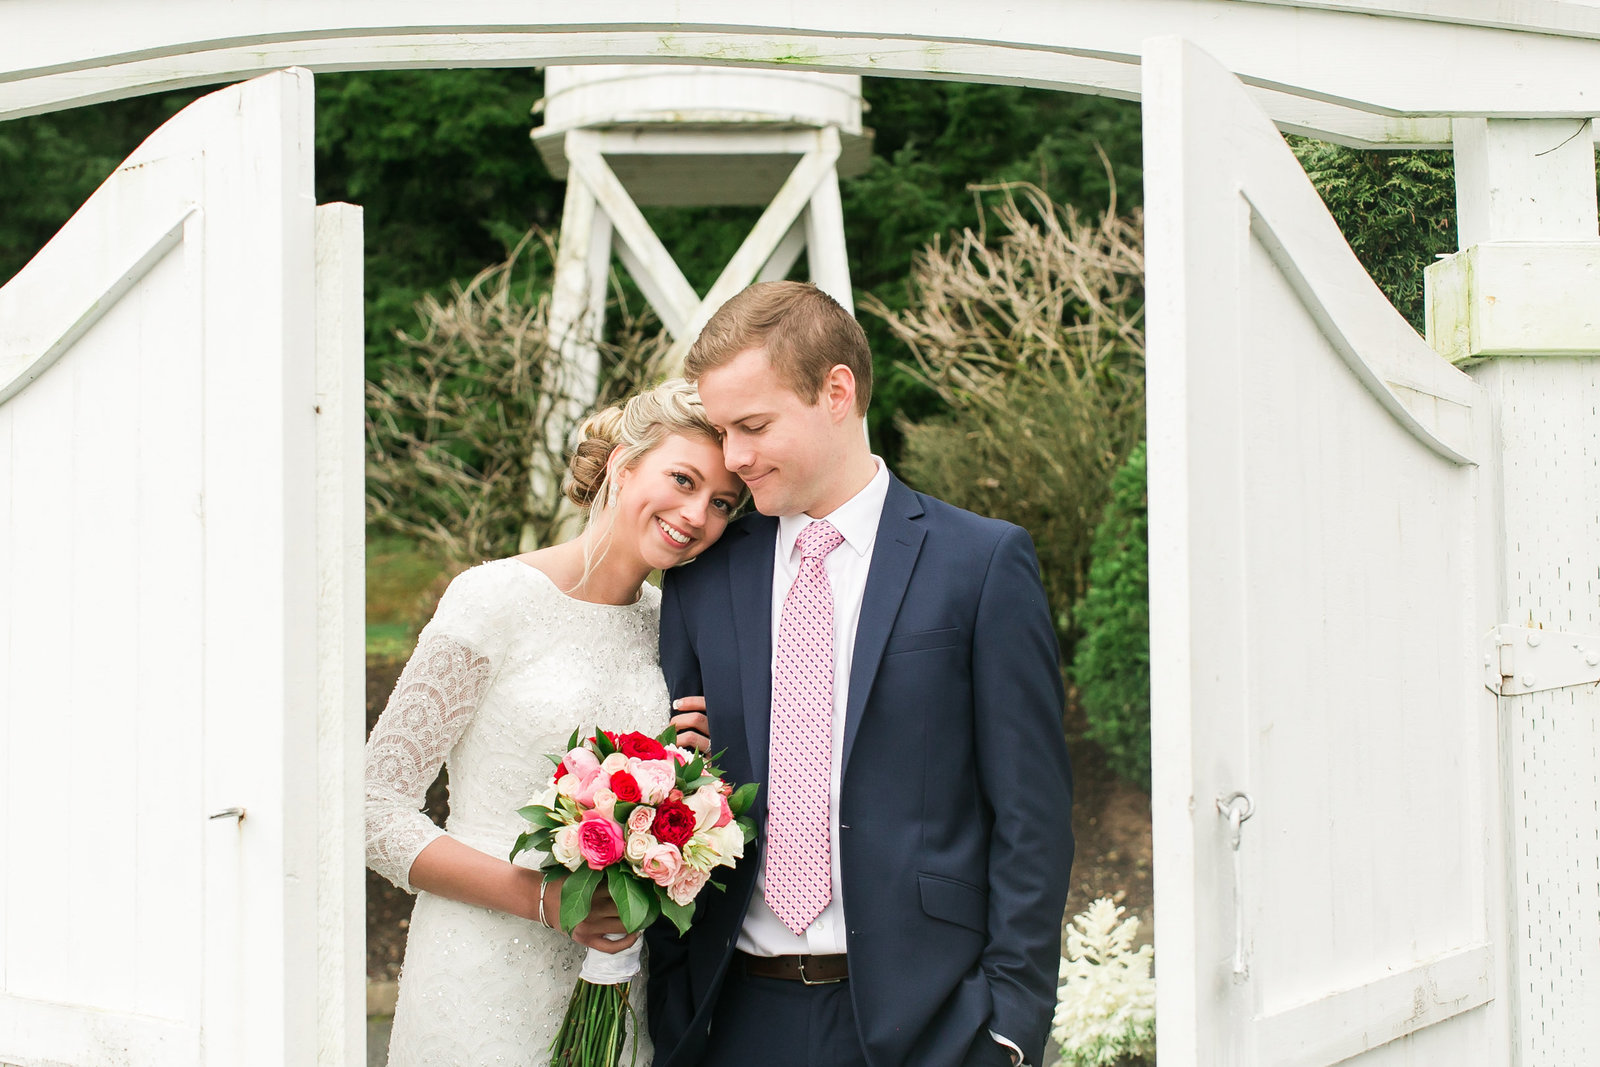 taylor-ann-hunter-wedding-reception447037